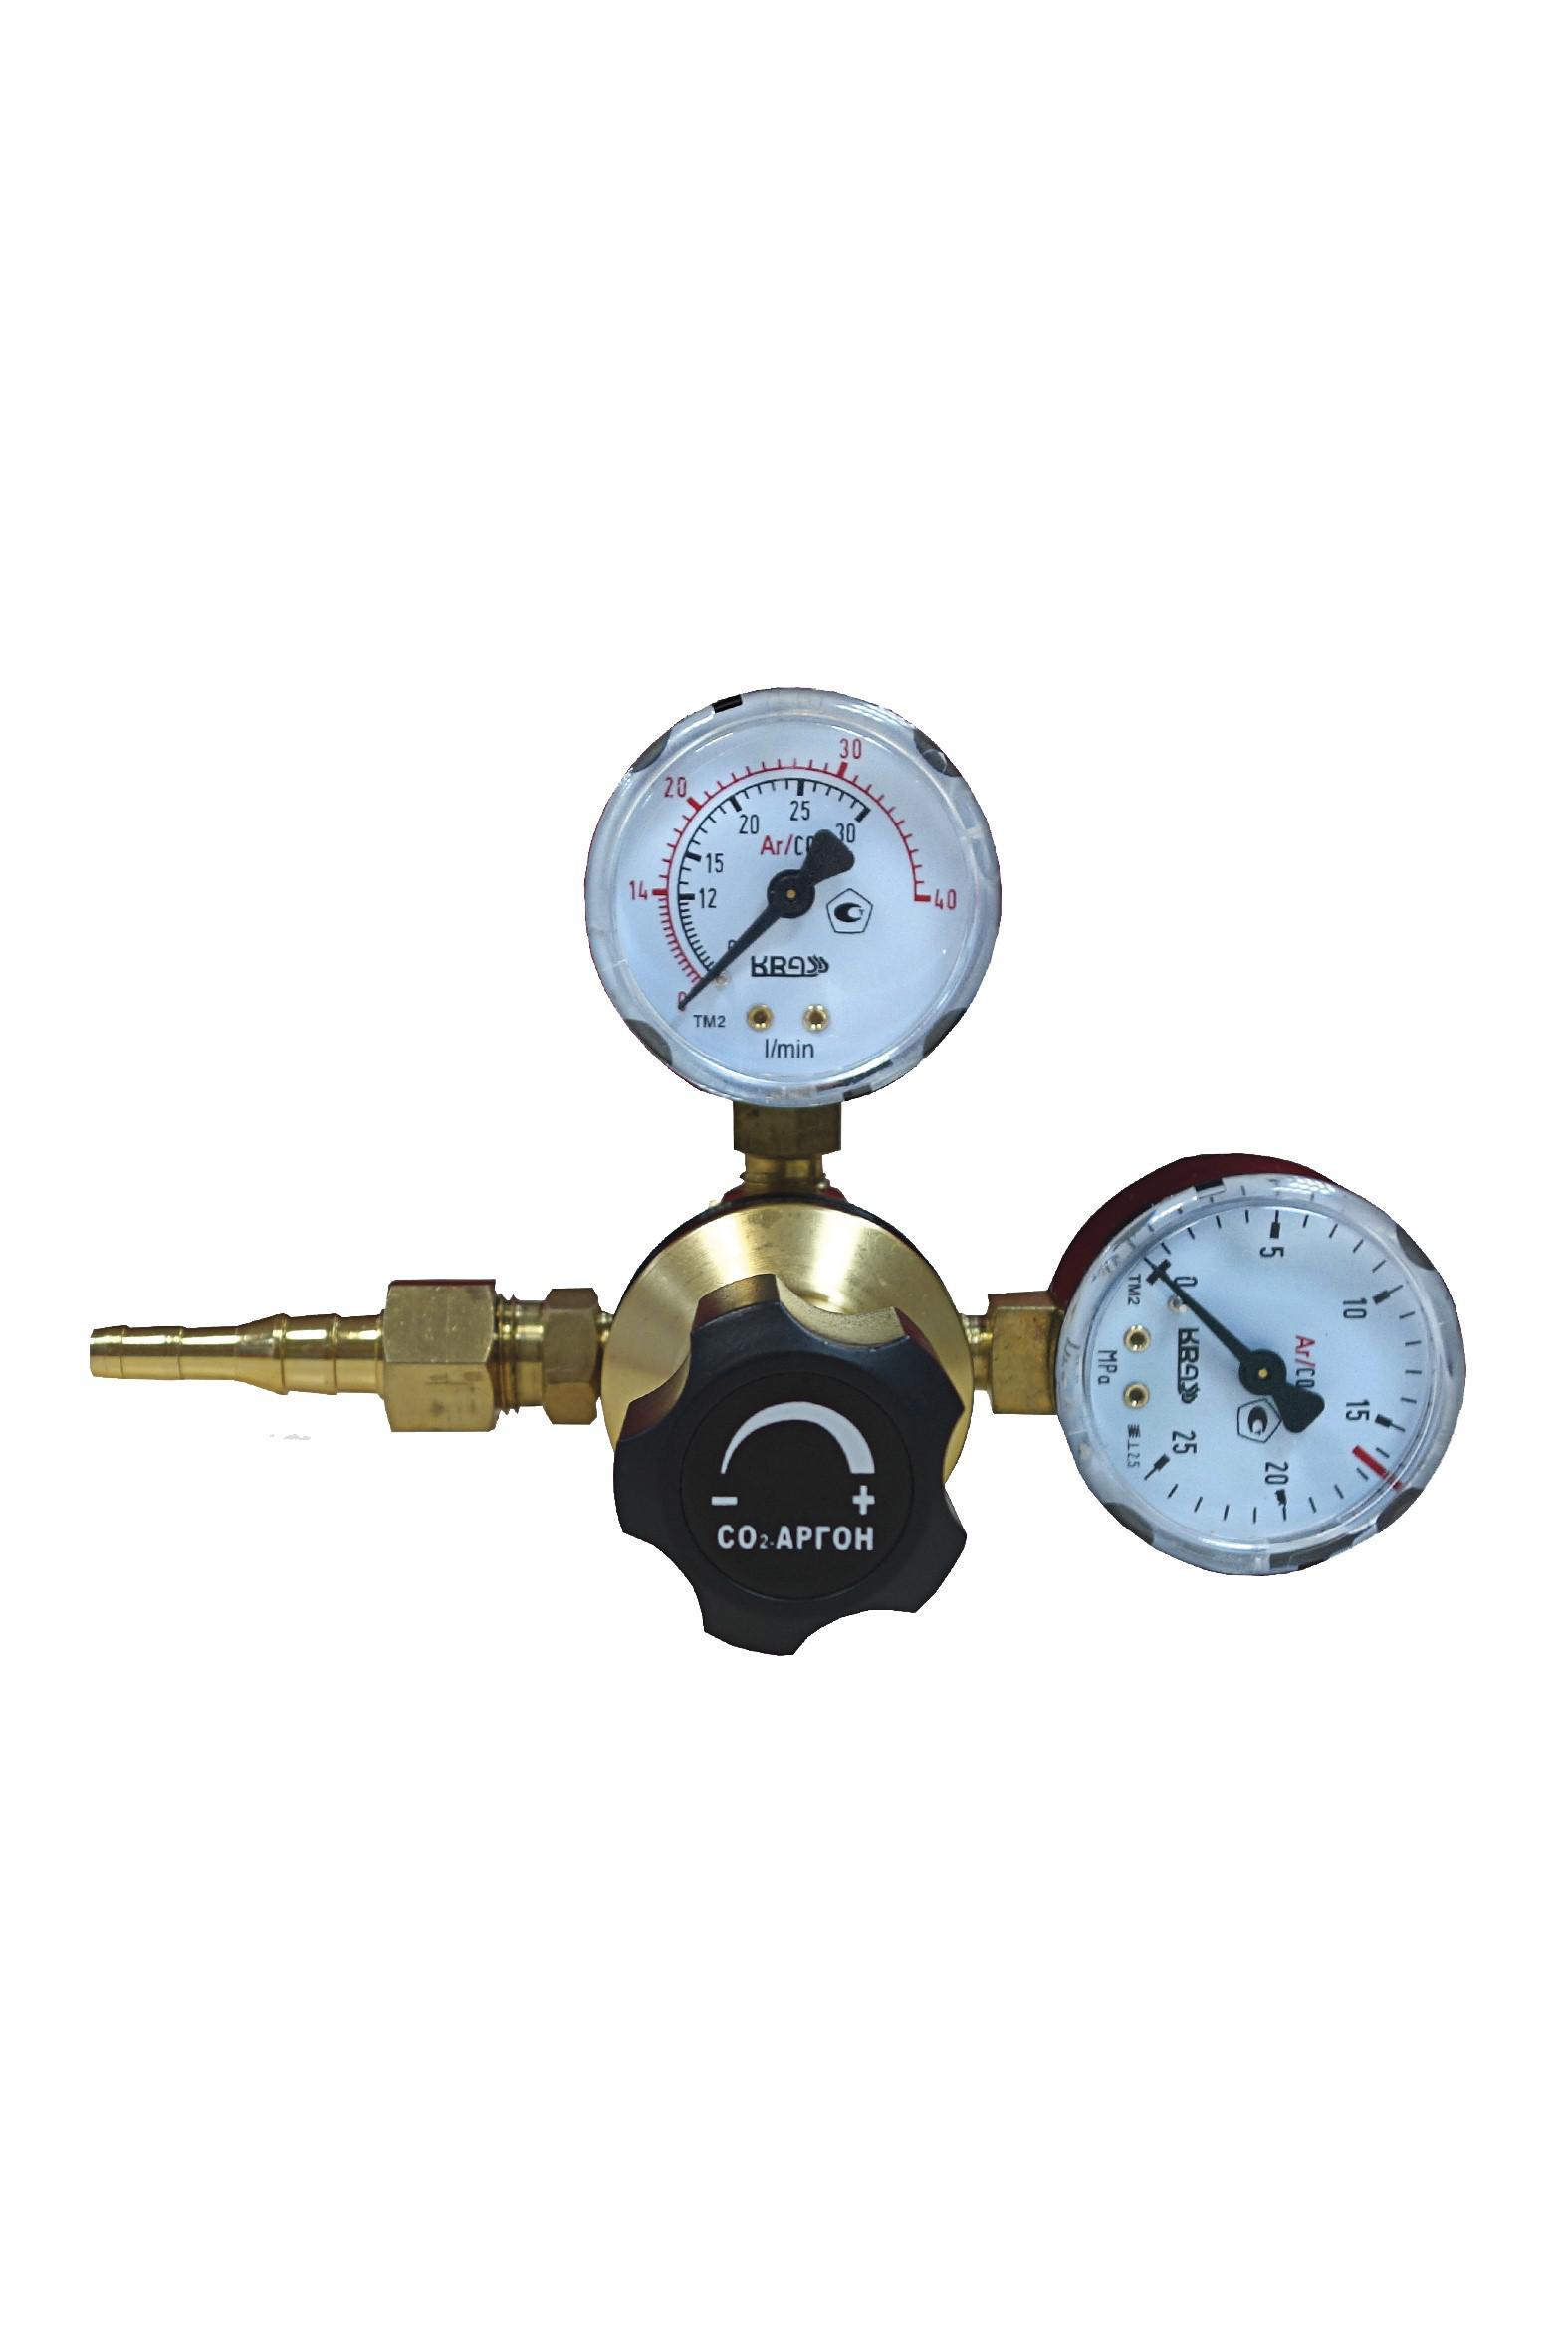 Регулятор Krass У 30/АР 40 регулятор давления топлива спорт ауди 100 2 3 е